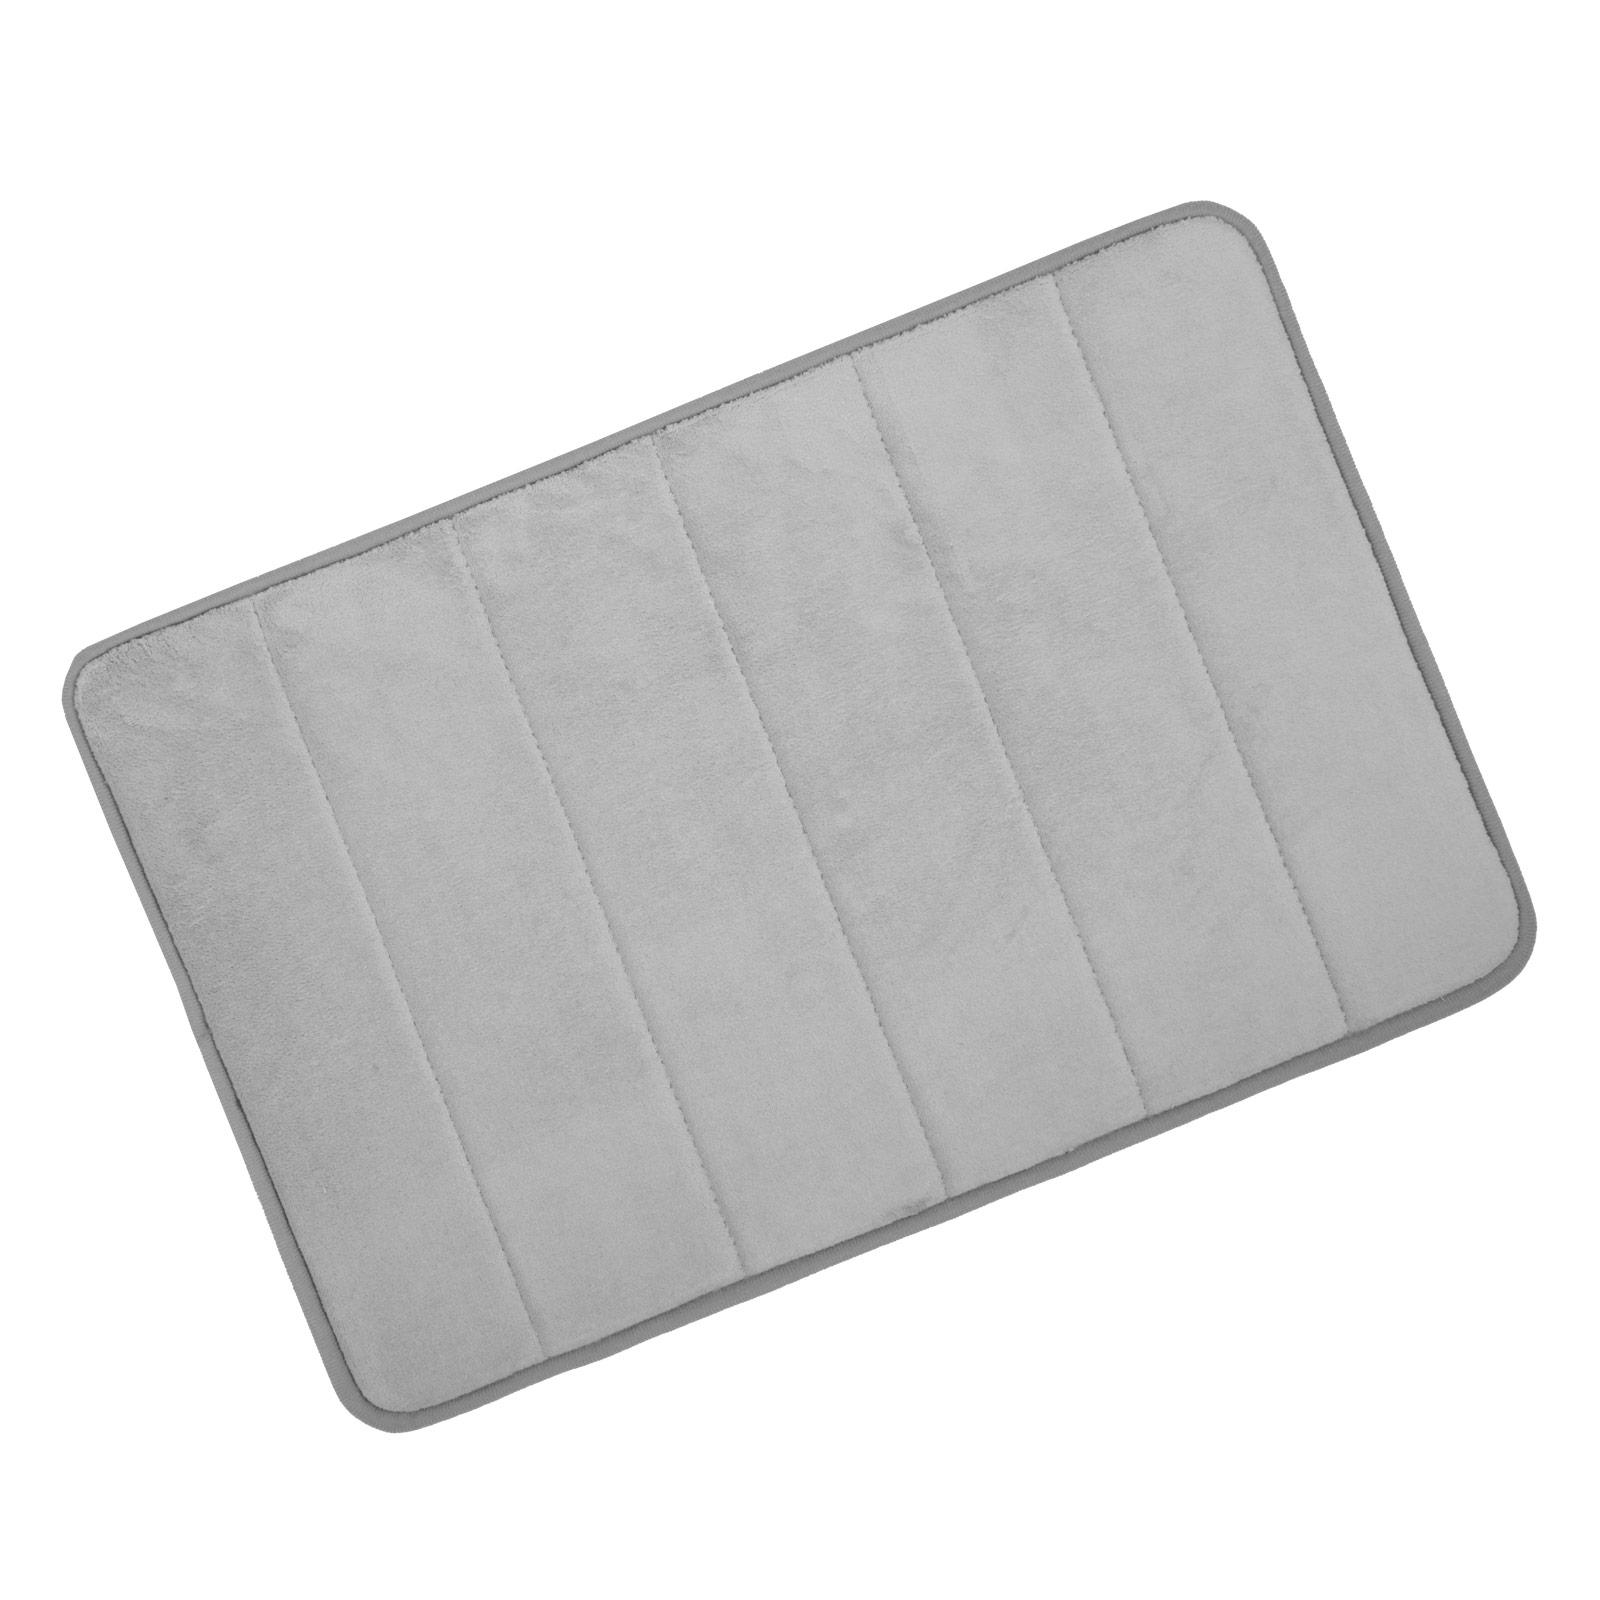 Microfibre Memory Foam Bathroom Shower Bath Mat With Non Slip Back